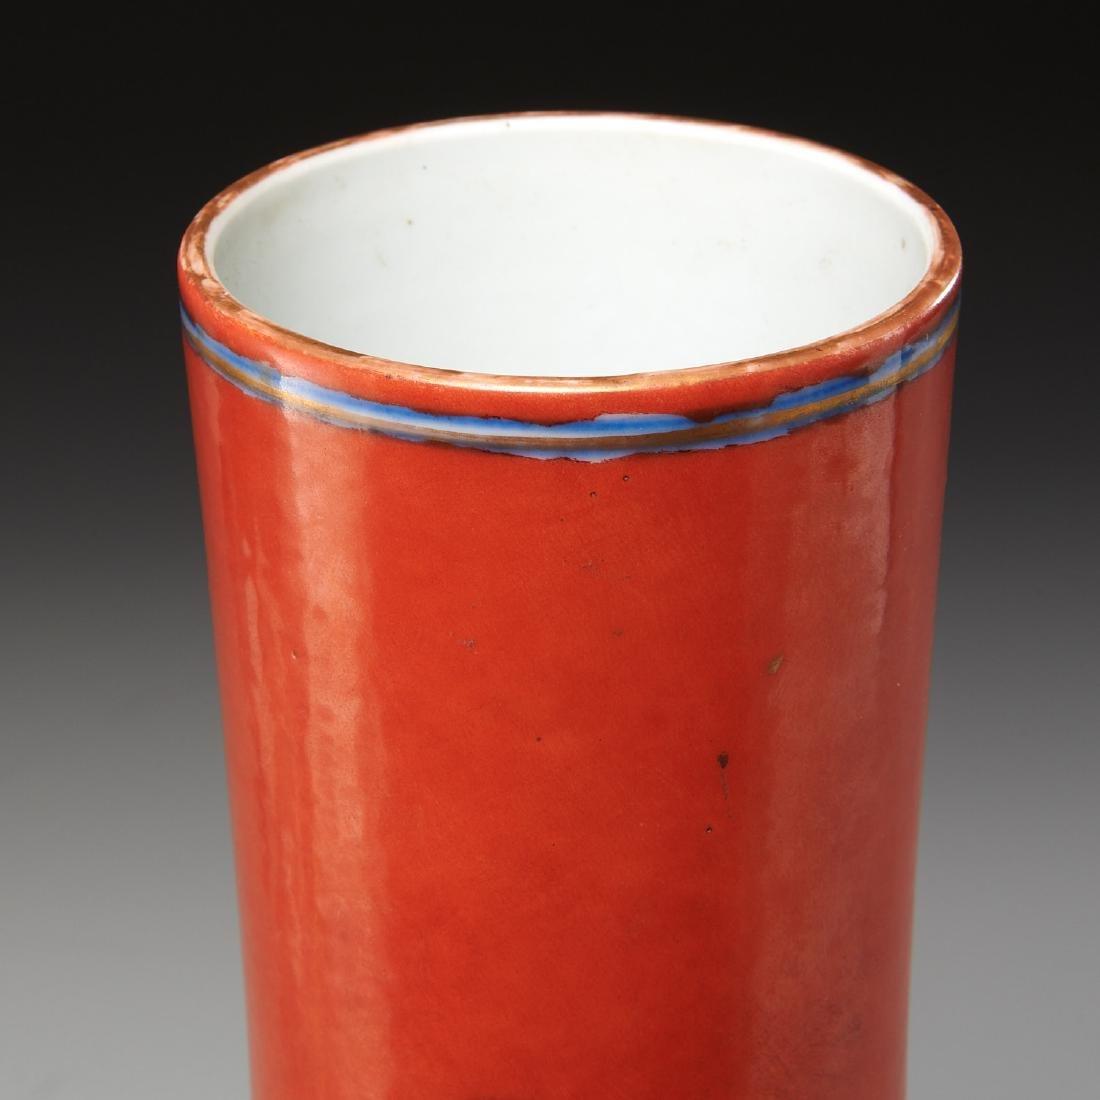 Chinese iron red ground porcelain vase - 2